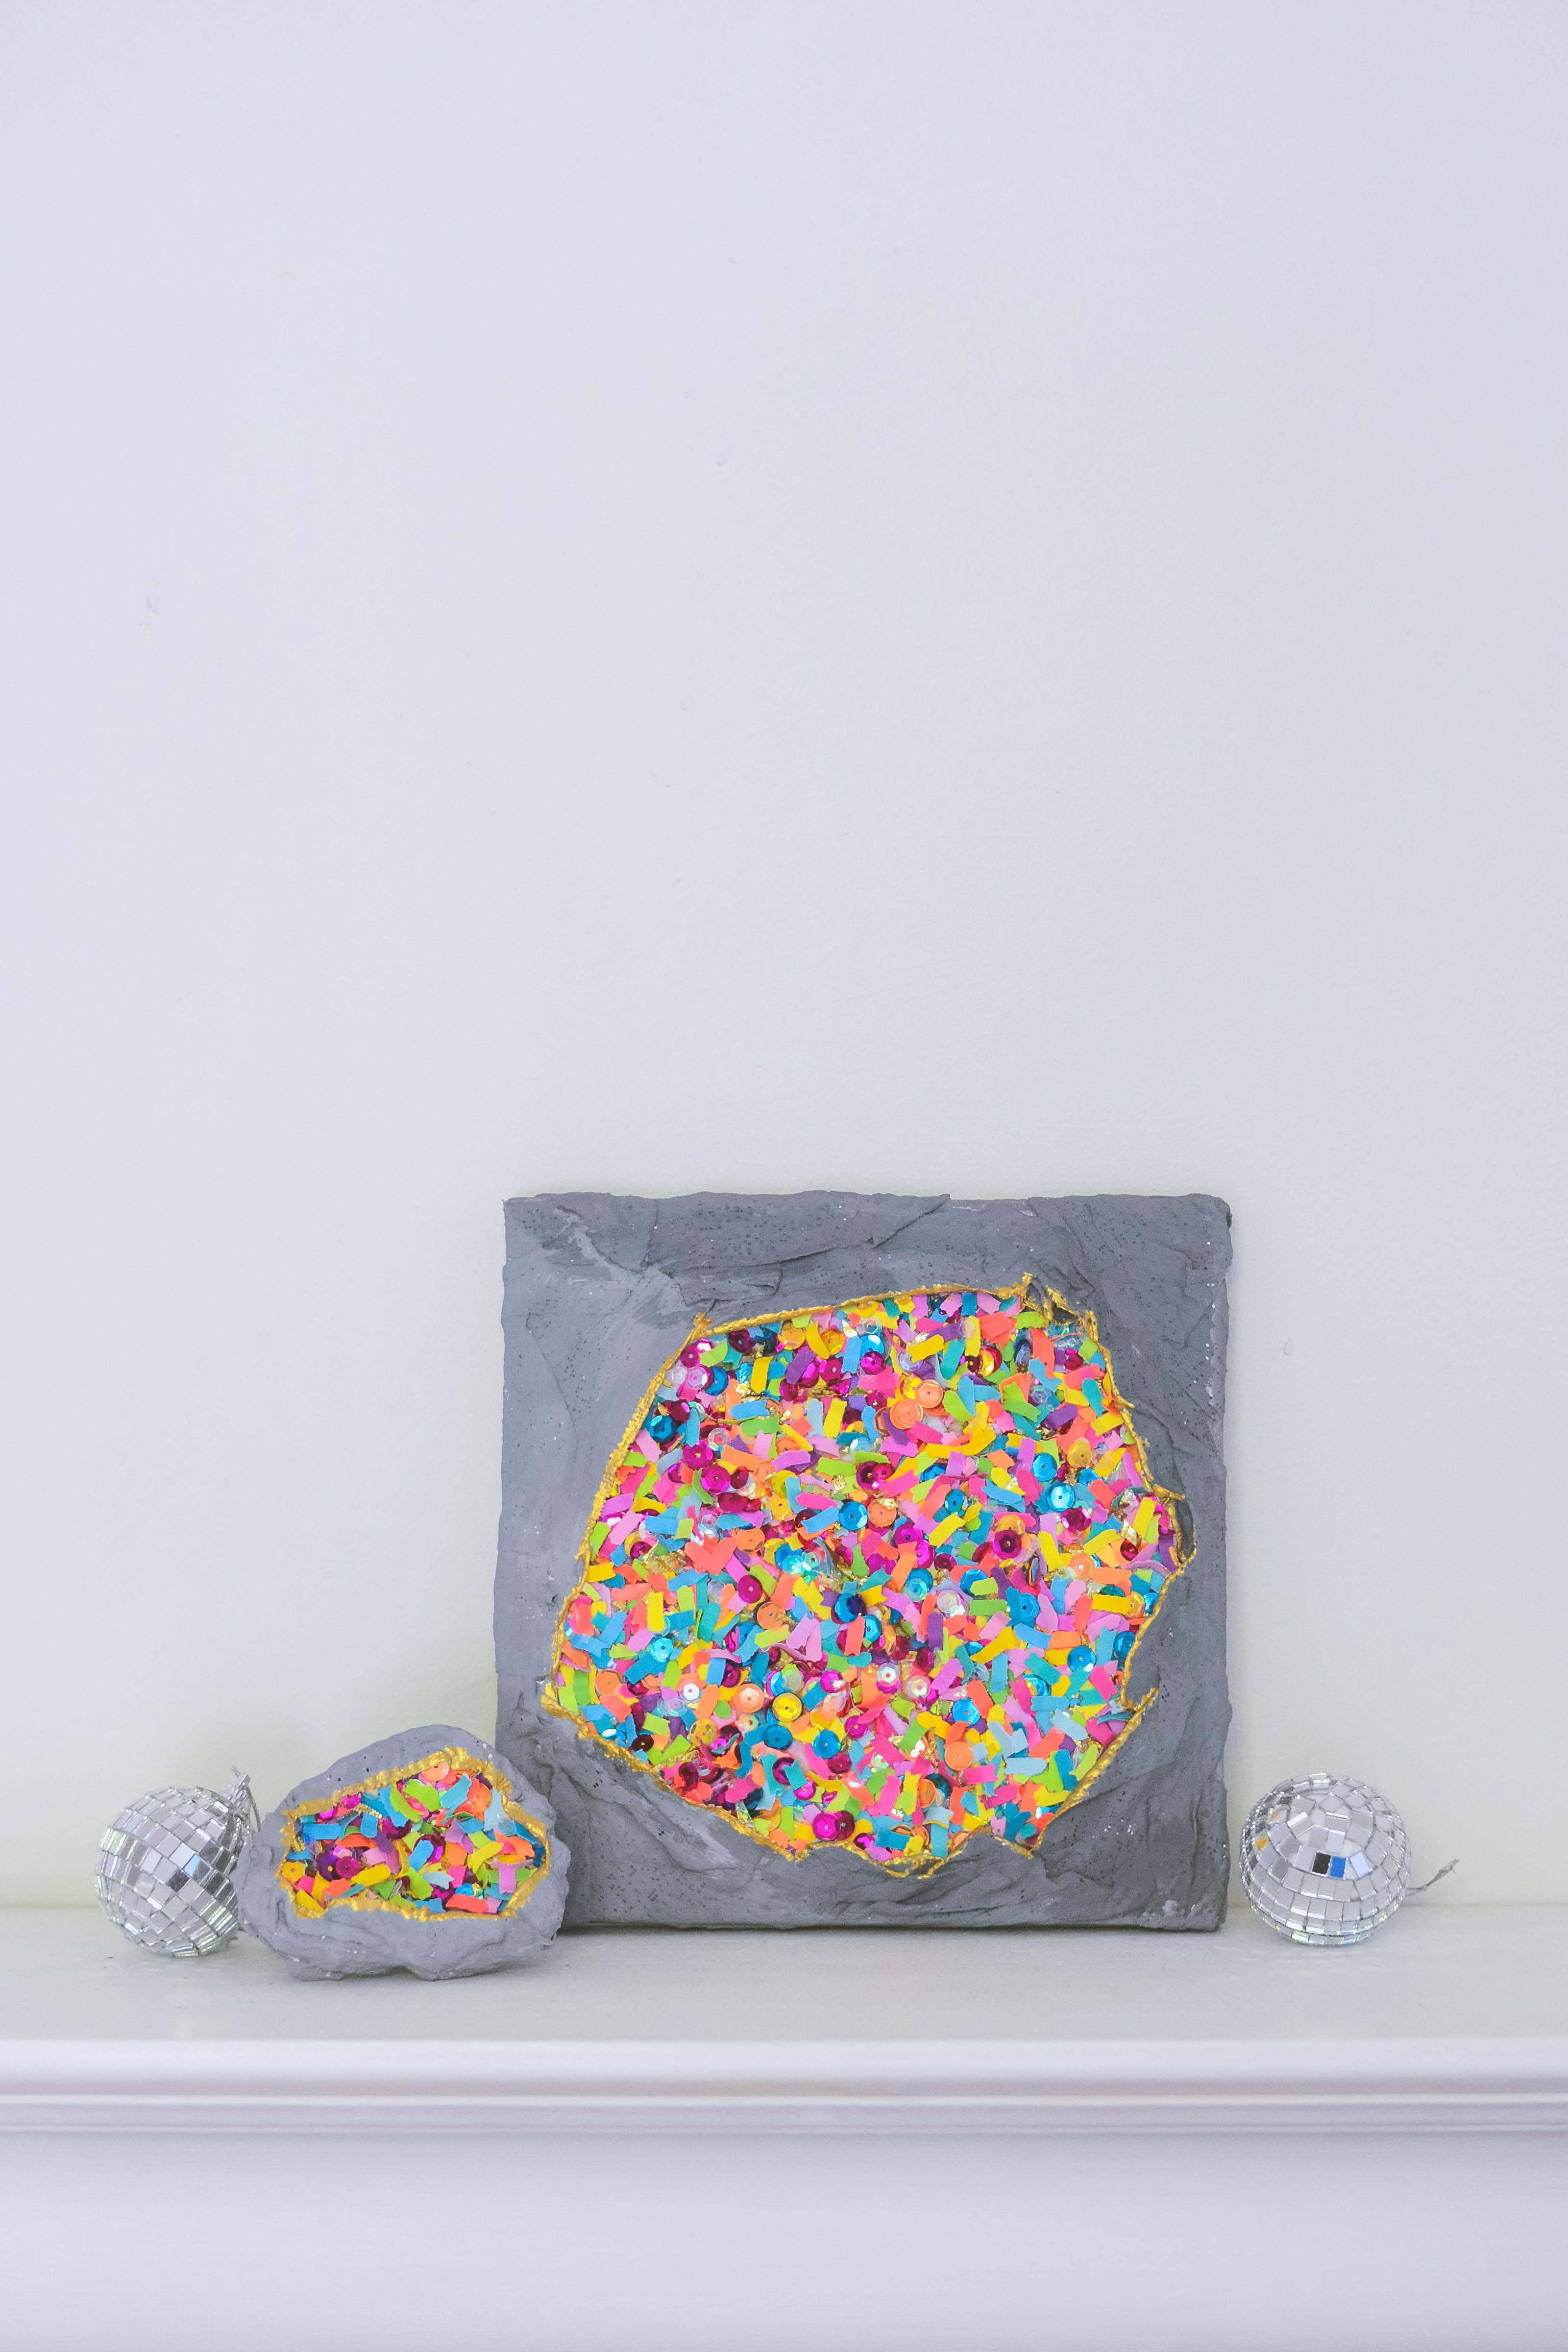 DIY wall art with confetti geodes